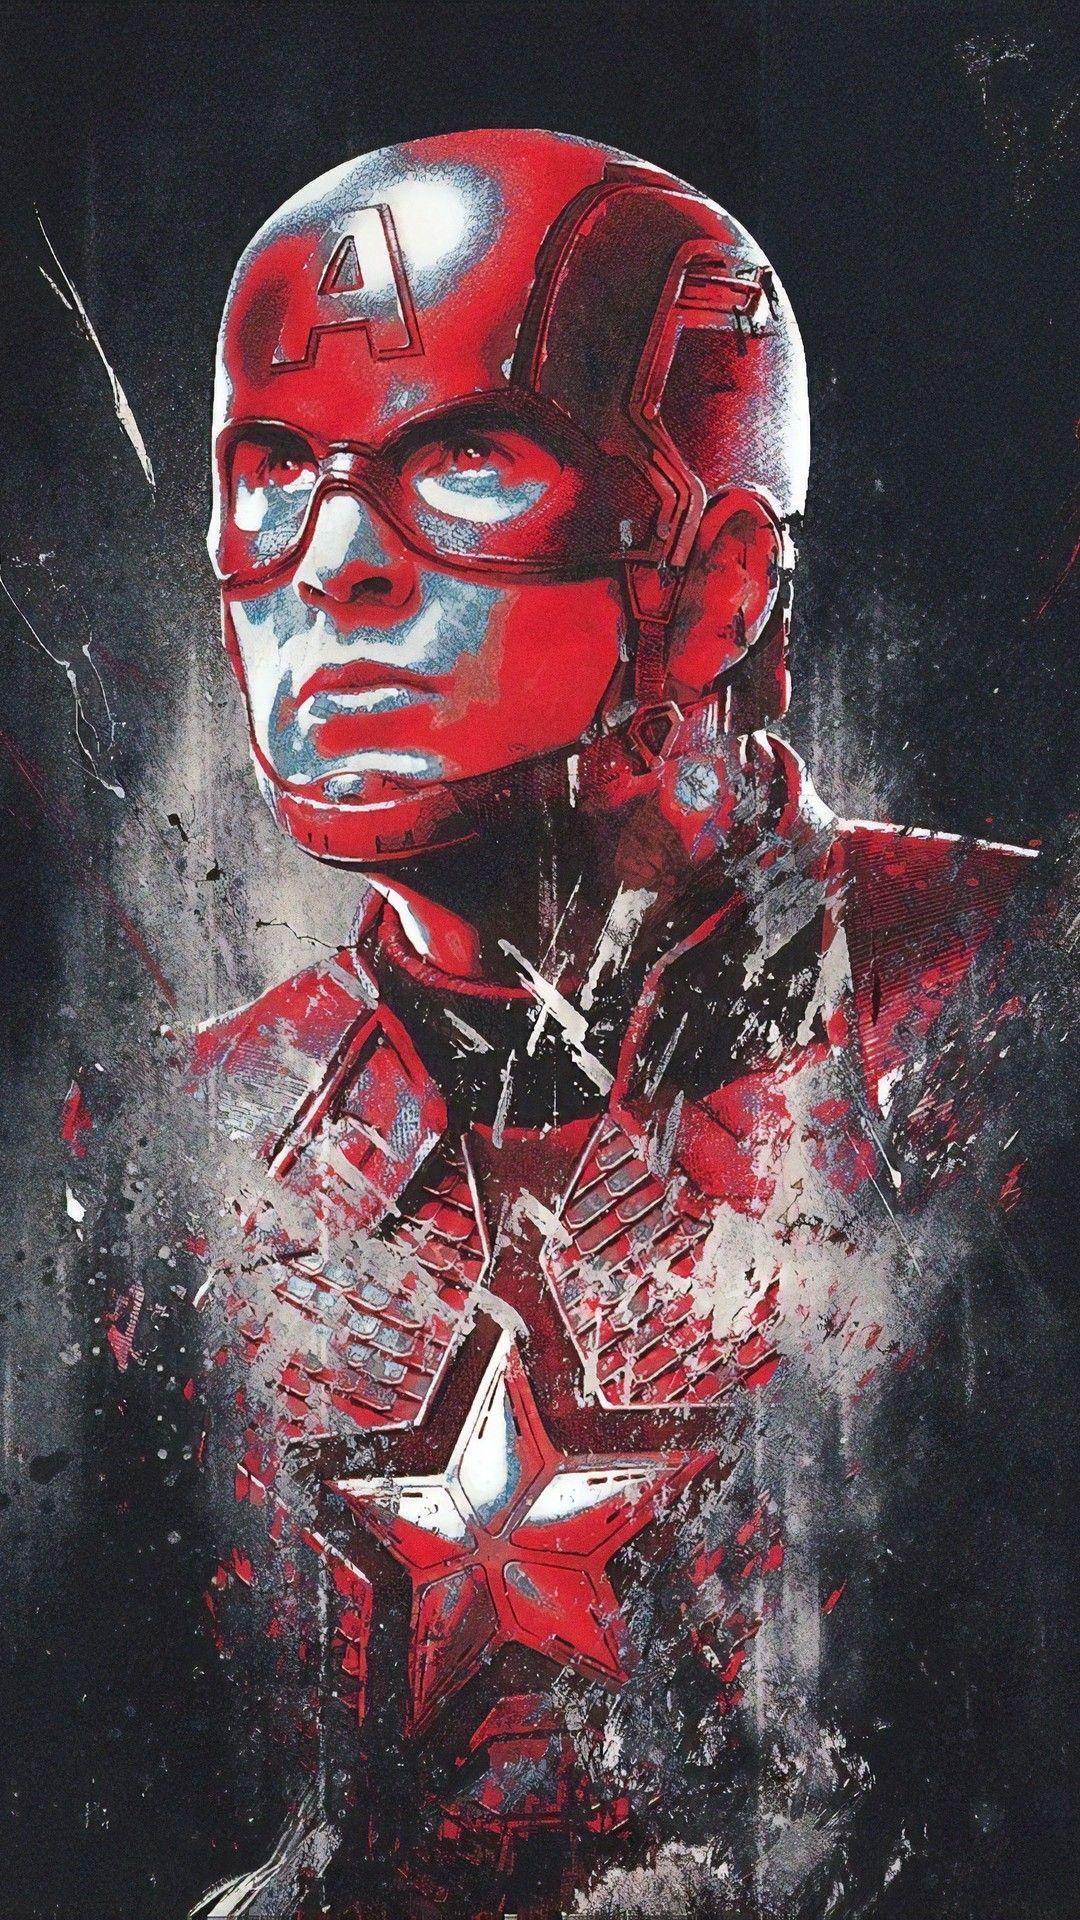 Iphone Wallpaper Avengers Endgame Best Iphone Wallpaper Marvel Characters Art Marvel Cinematic Avengers Pictures